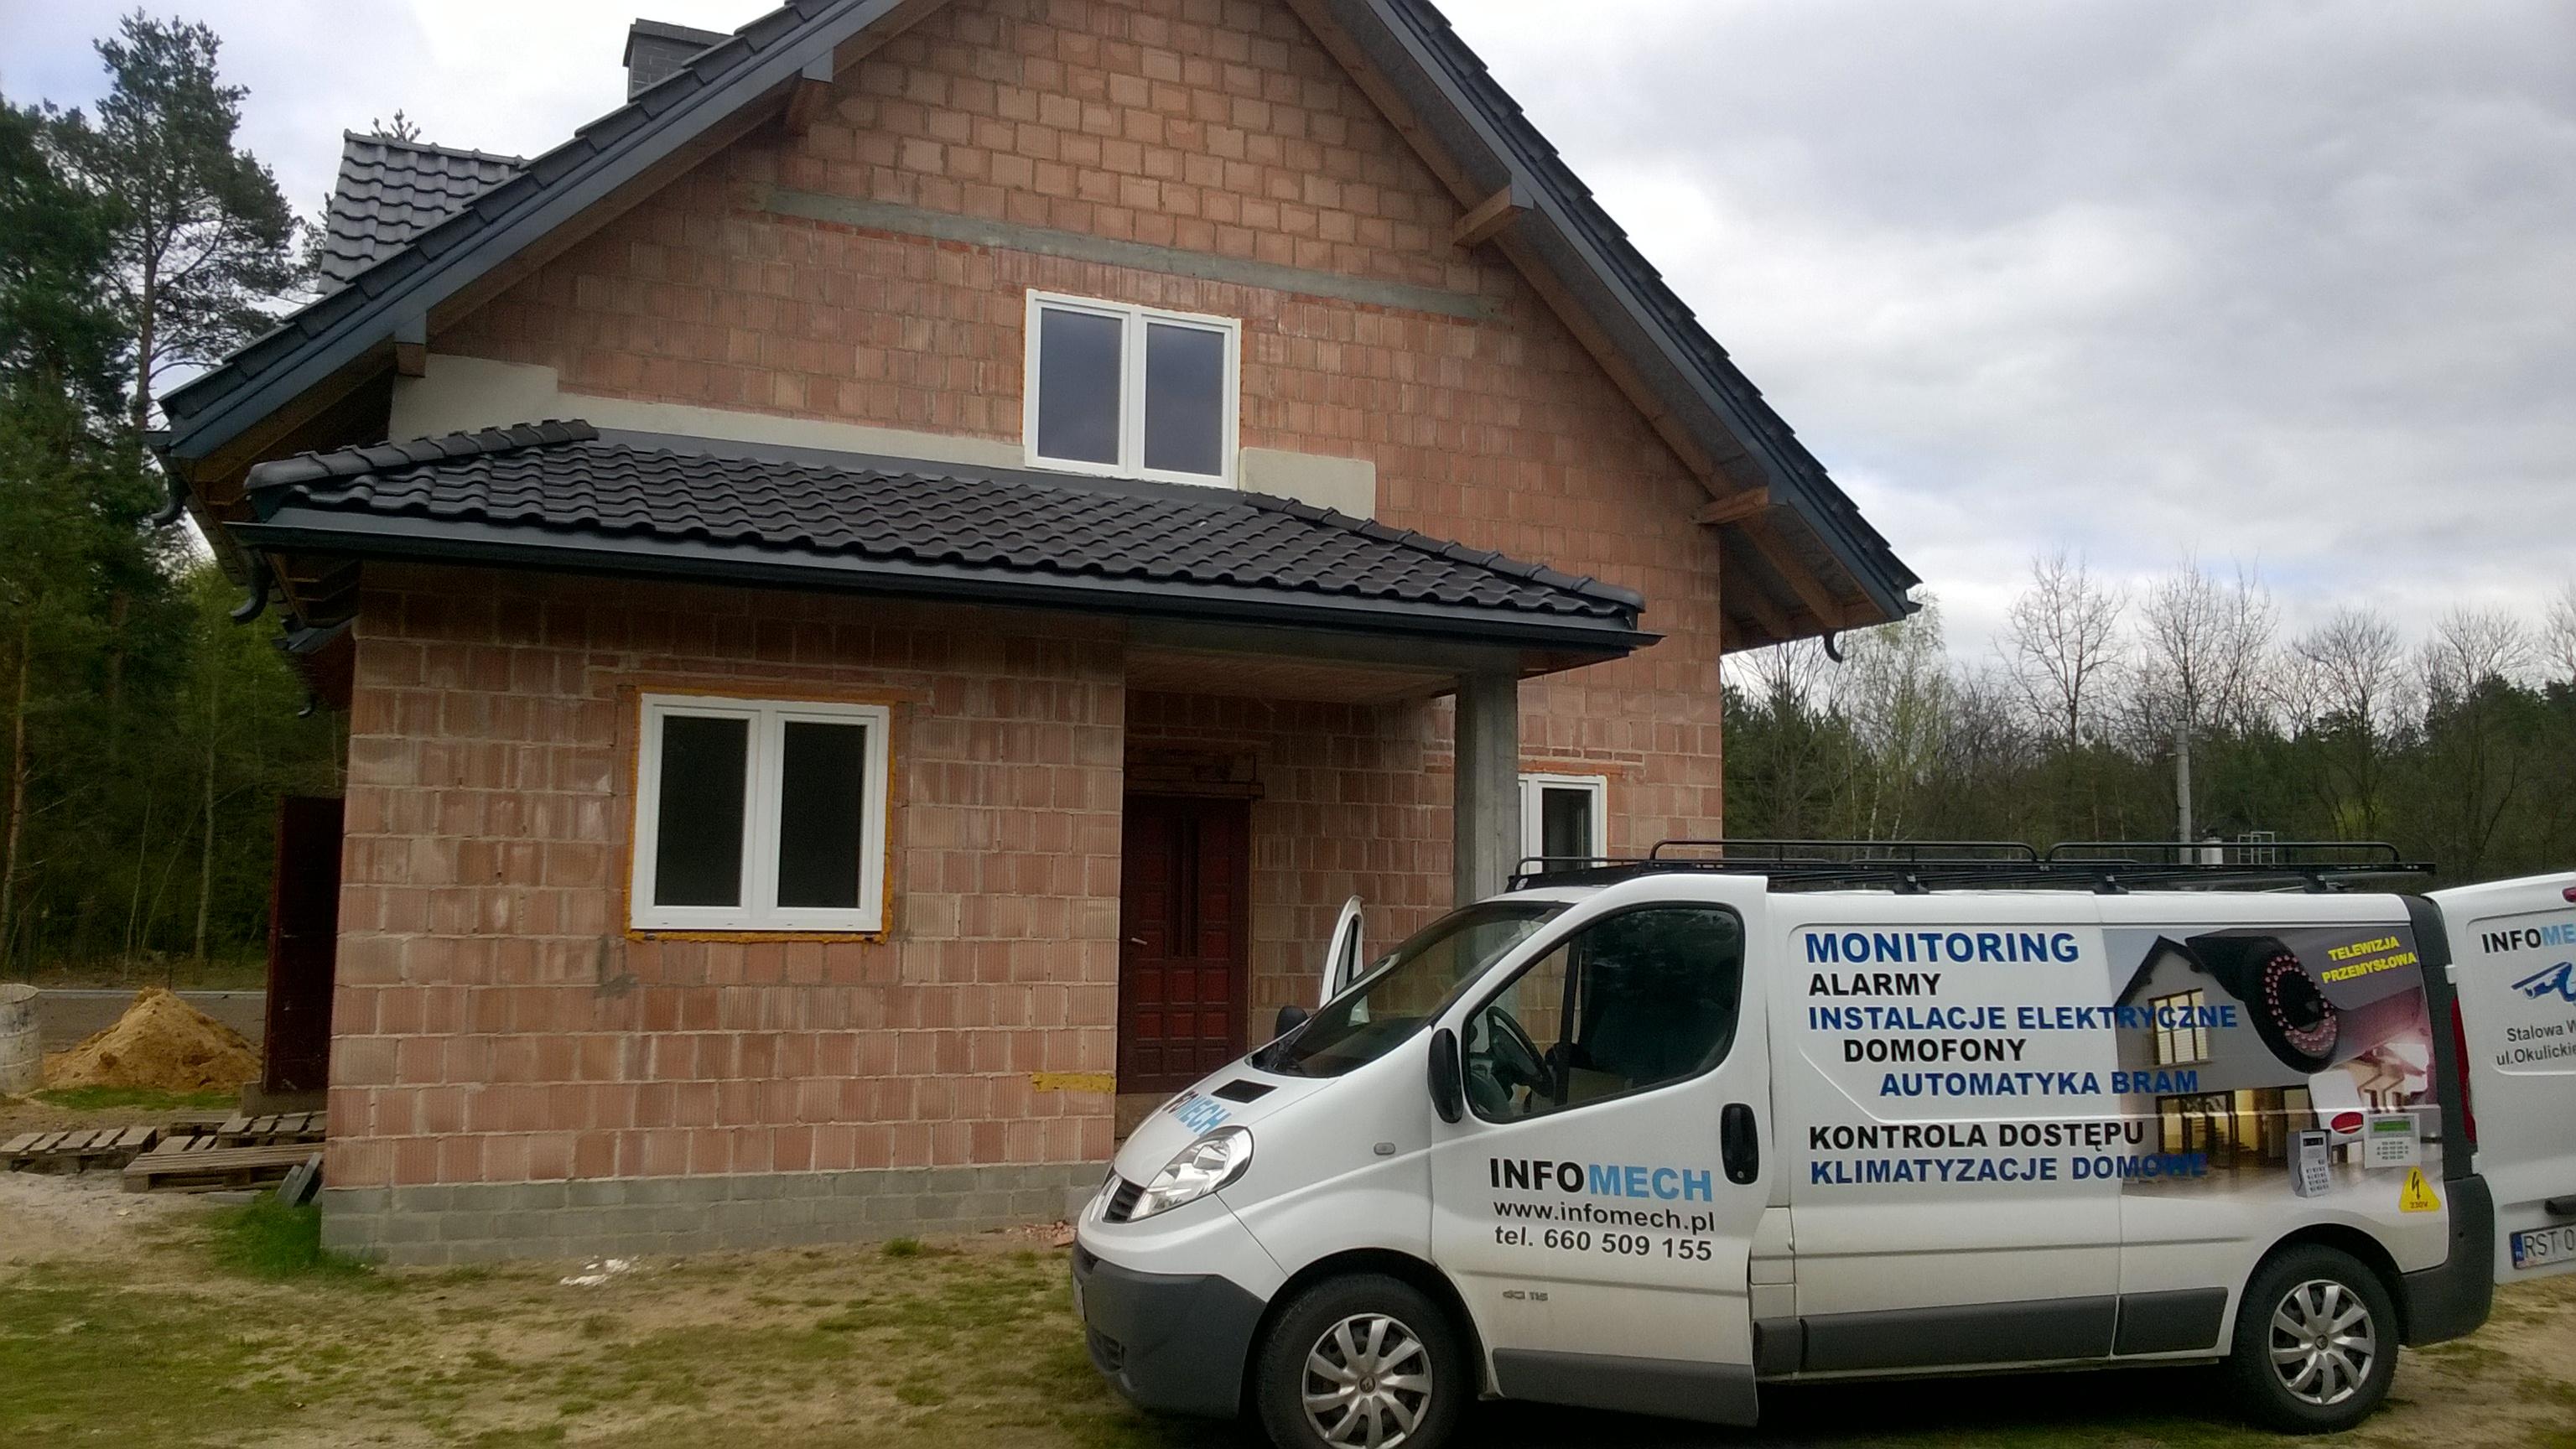 Montaż monitoringu TurboHD Hikvision oraz alarmu Satel Versa okolice Ulanowa Biłgoraja - Dom Jednorodzinny